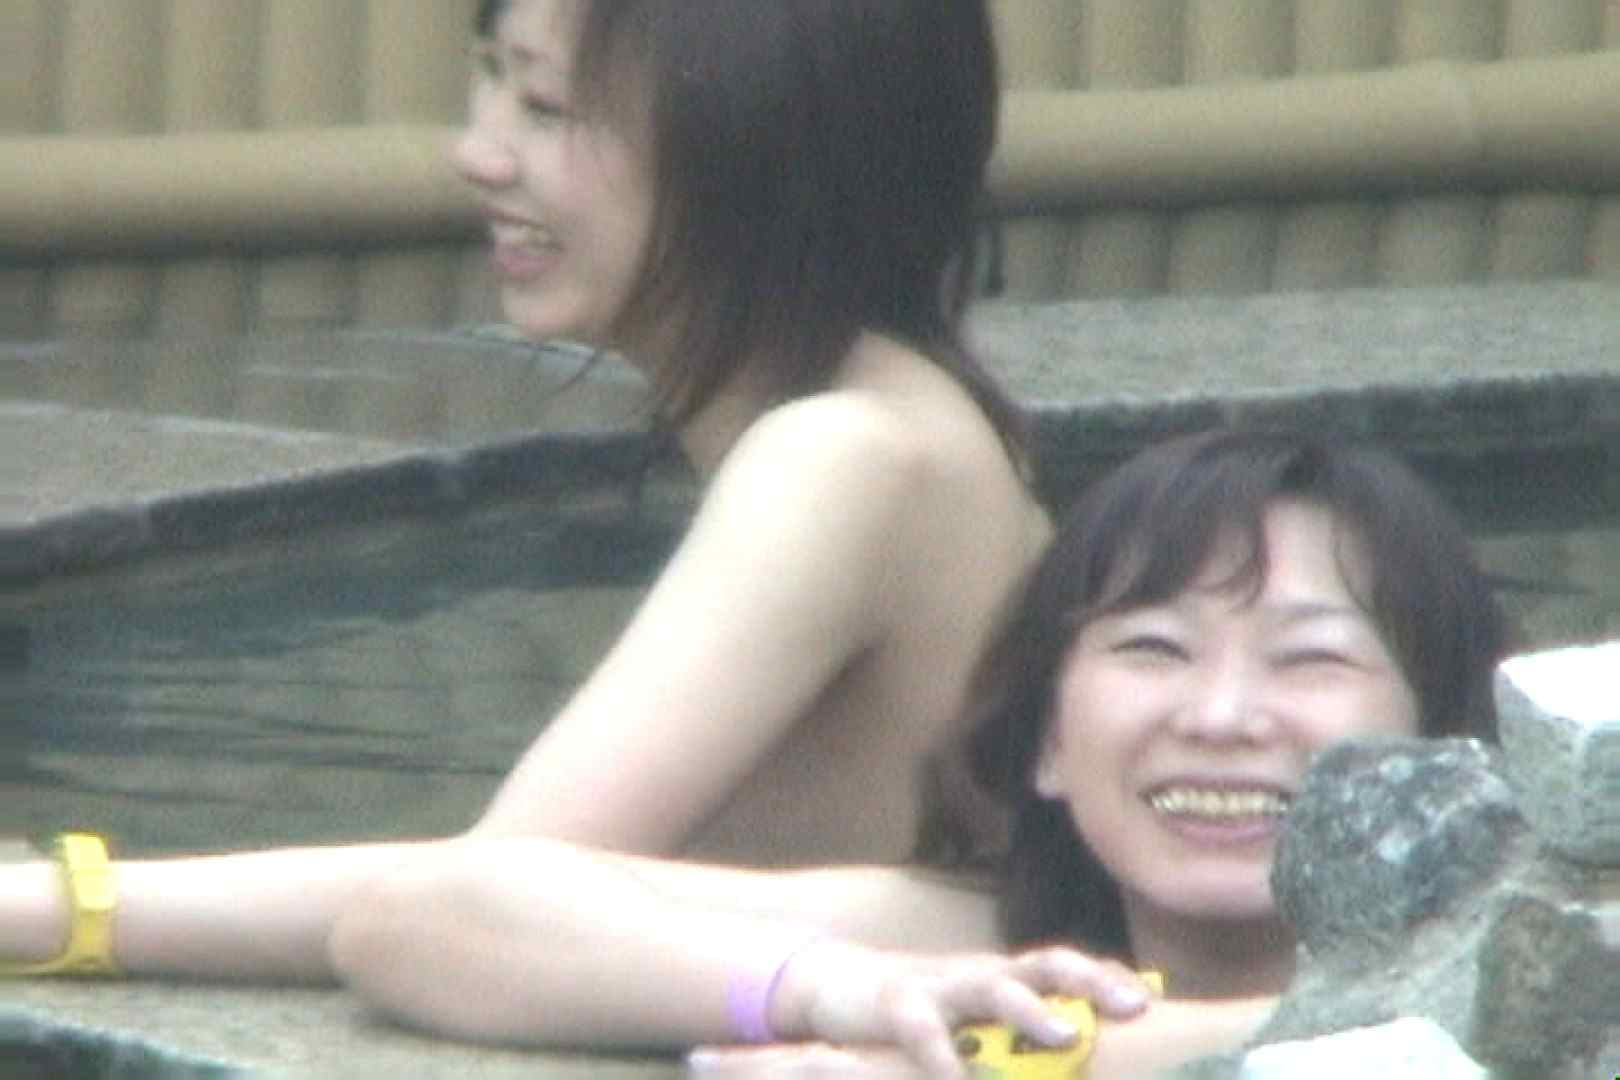 Aquaな露天風呂Vol.58【VIP限定】 HなOL | 0  95pic 89